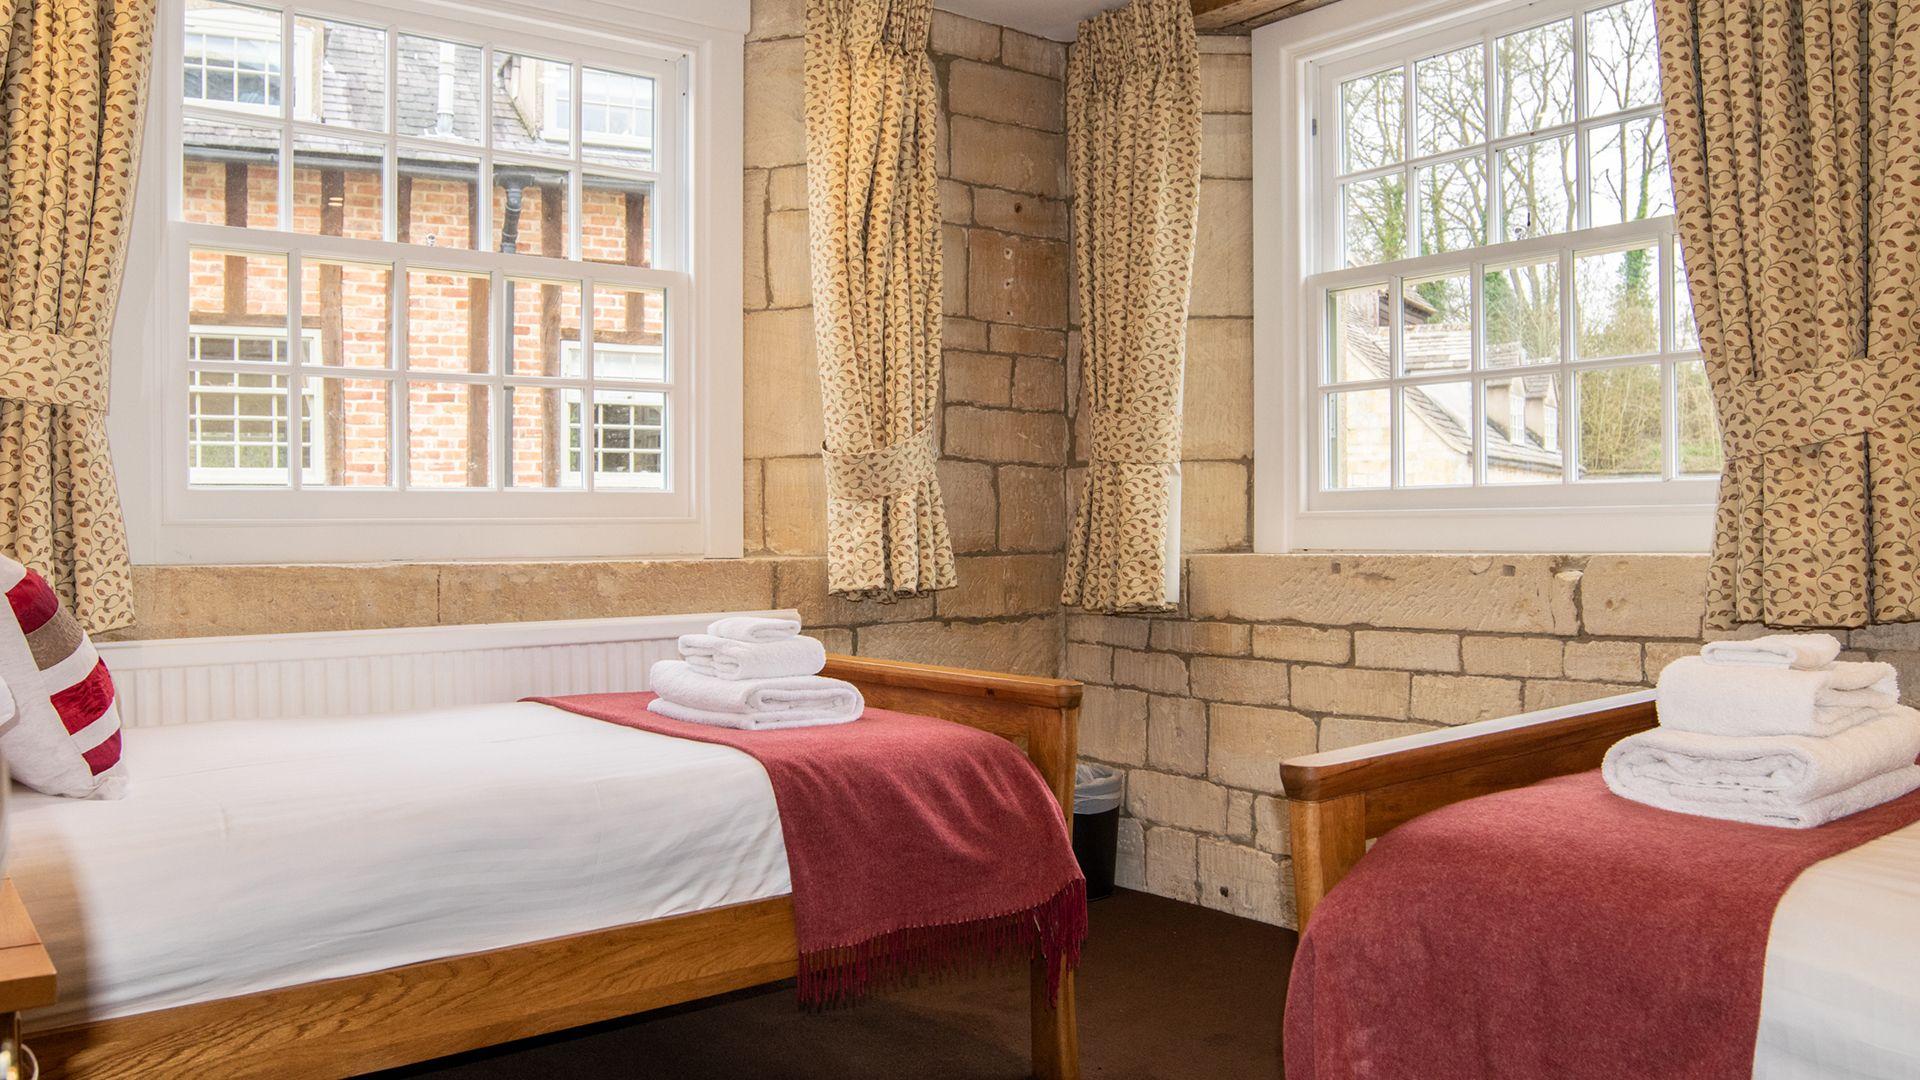 Bedroom 2, Princess Elizabeth at Sudeley Castle, Bolthole Retreats